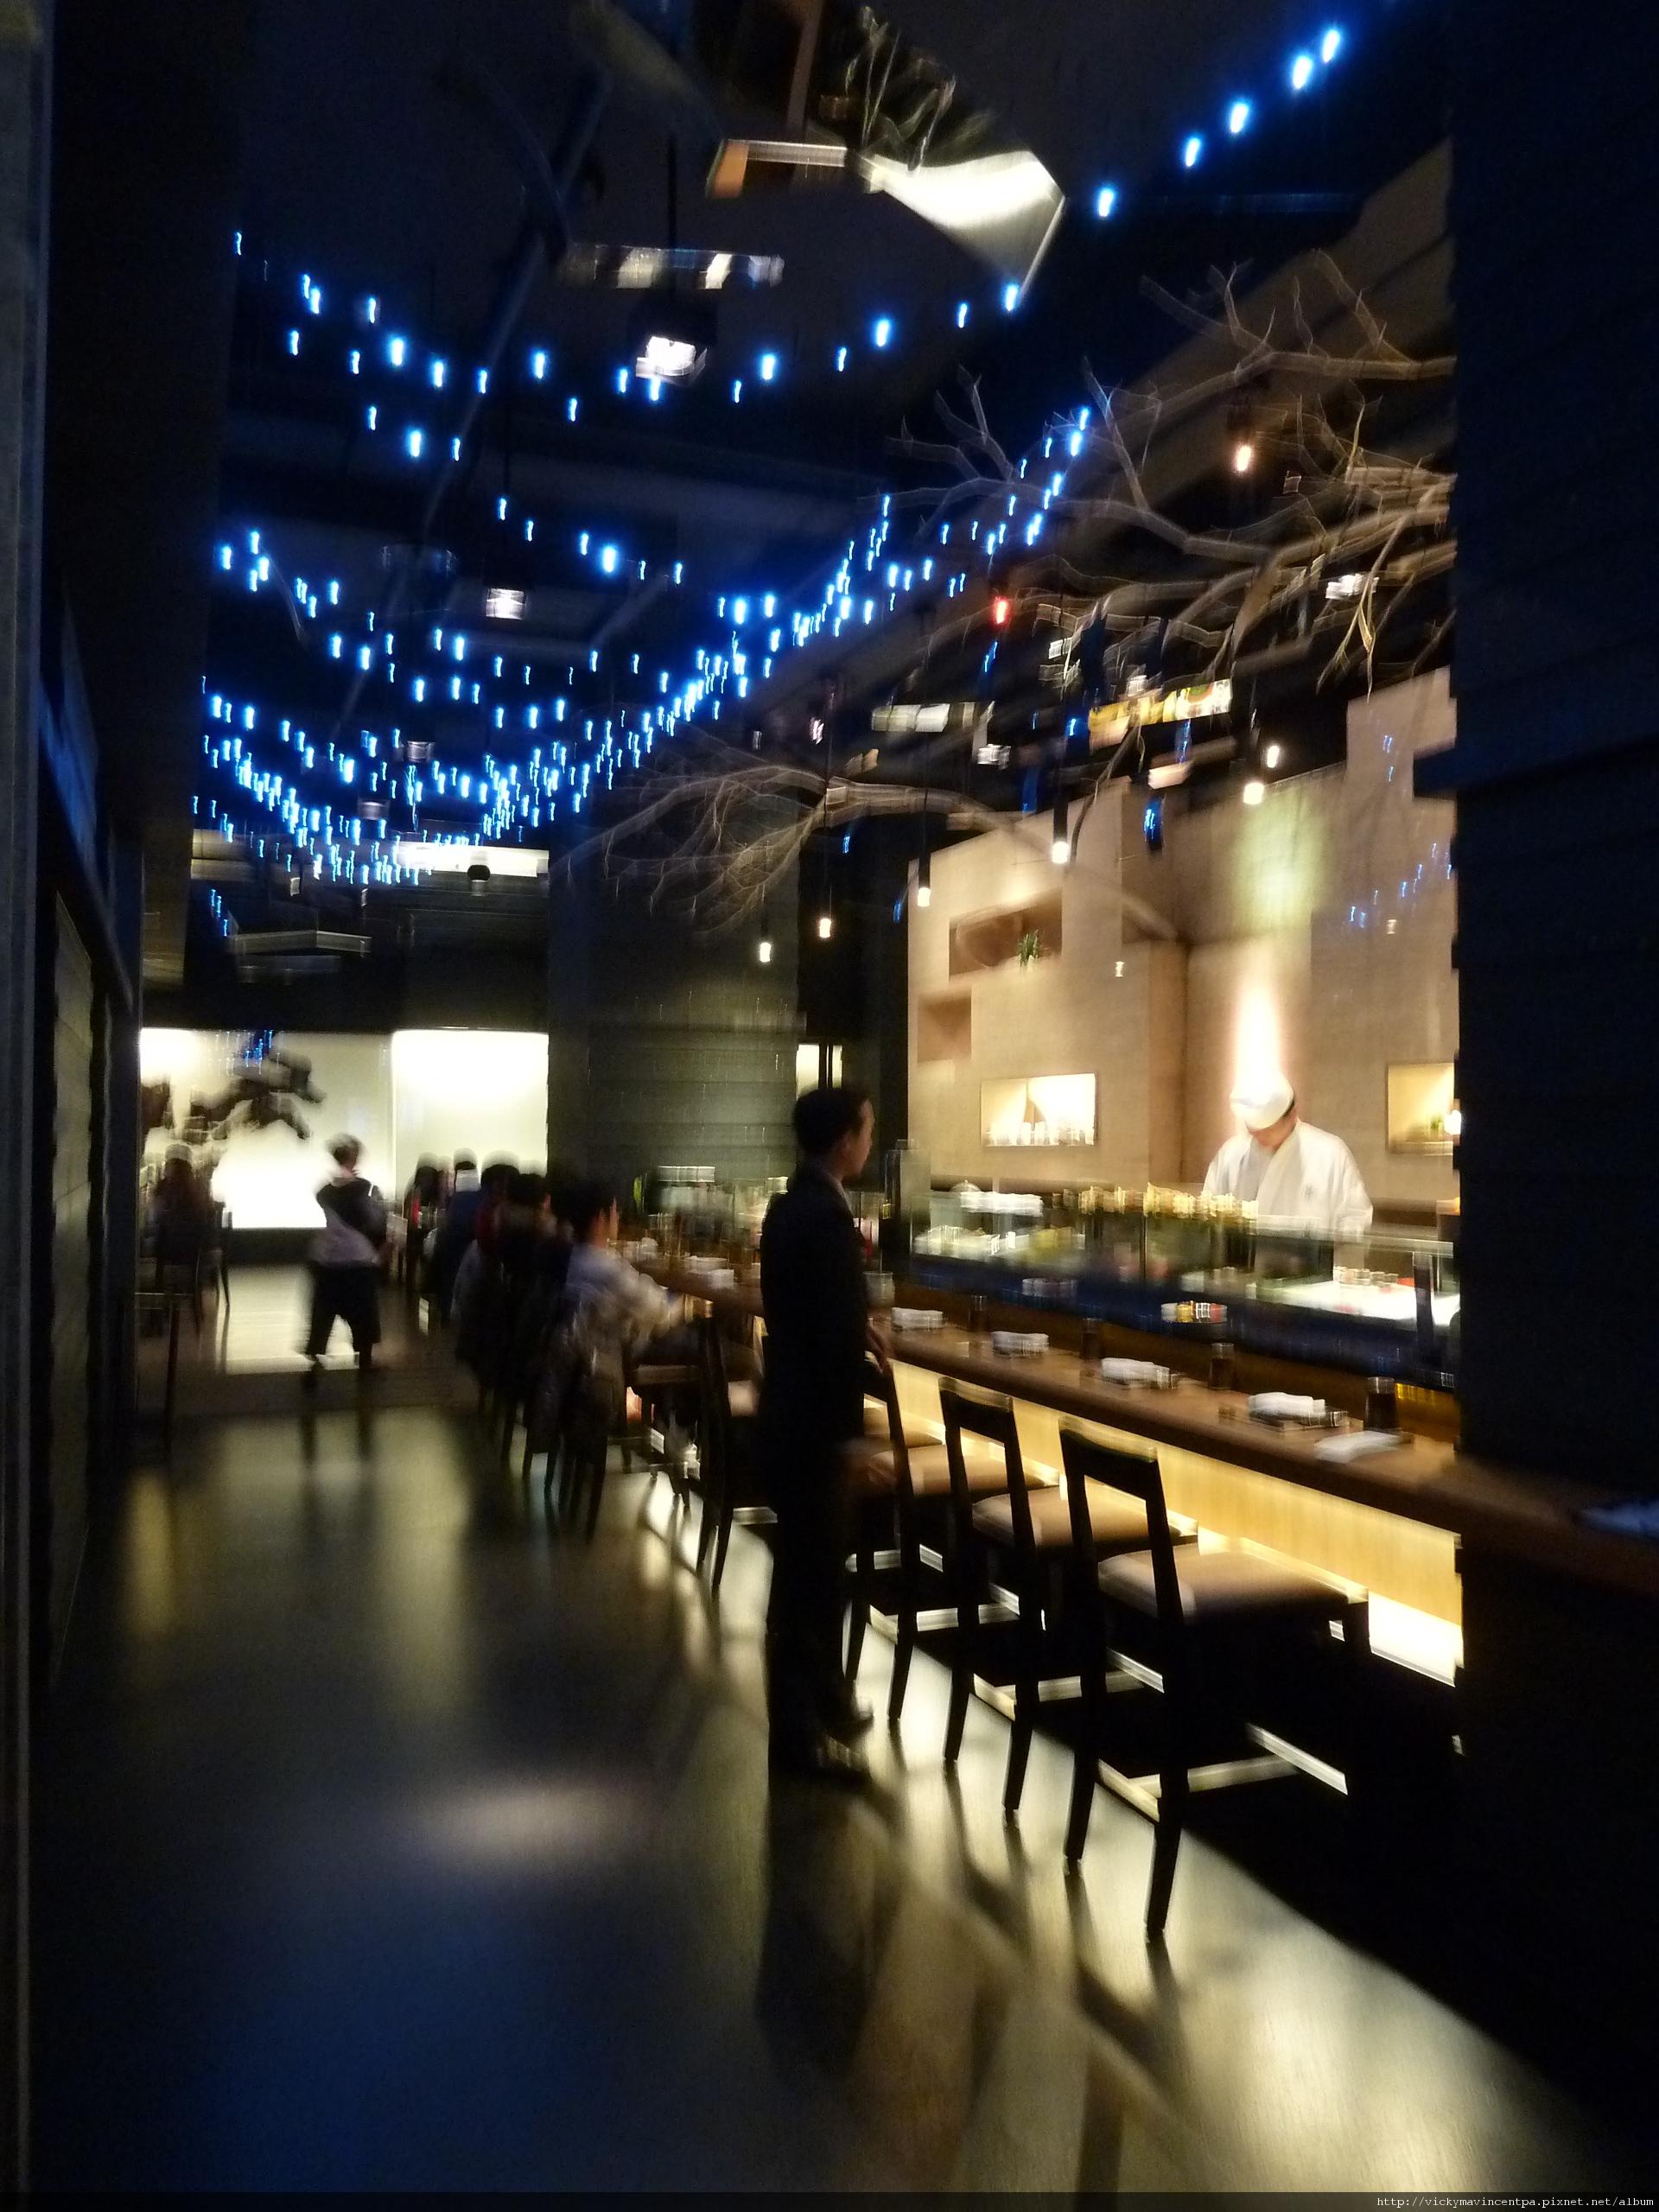 裝璜像個日式lounge bar